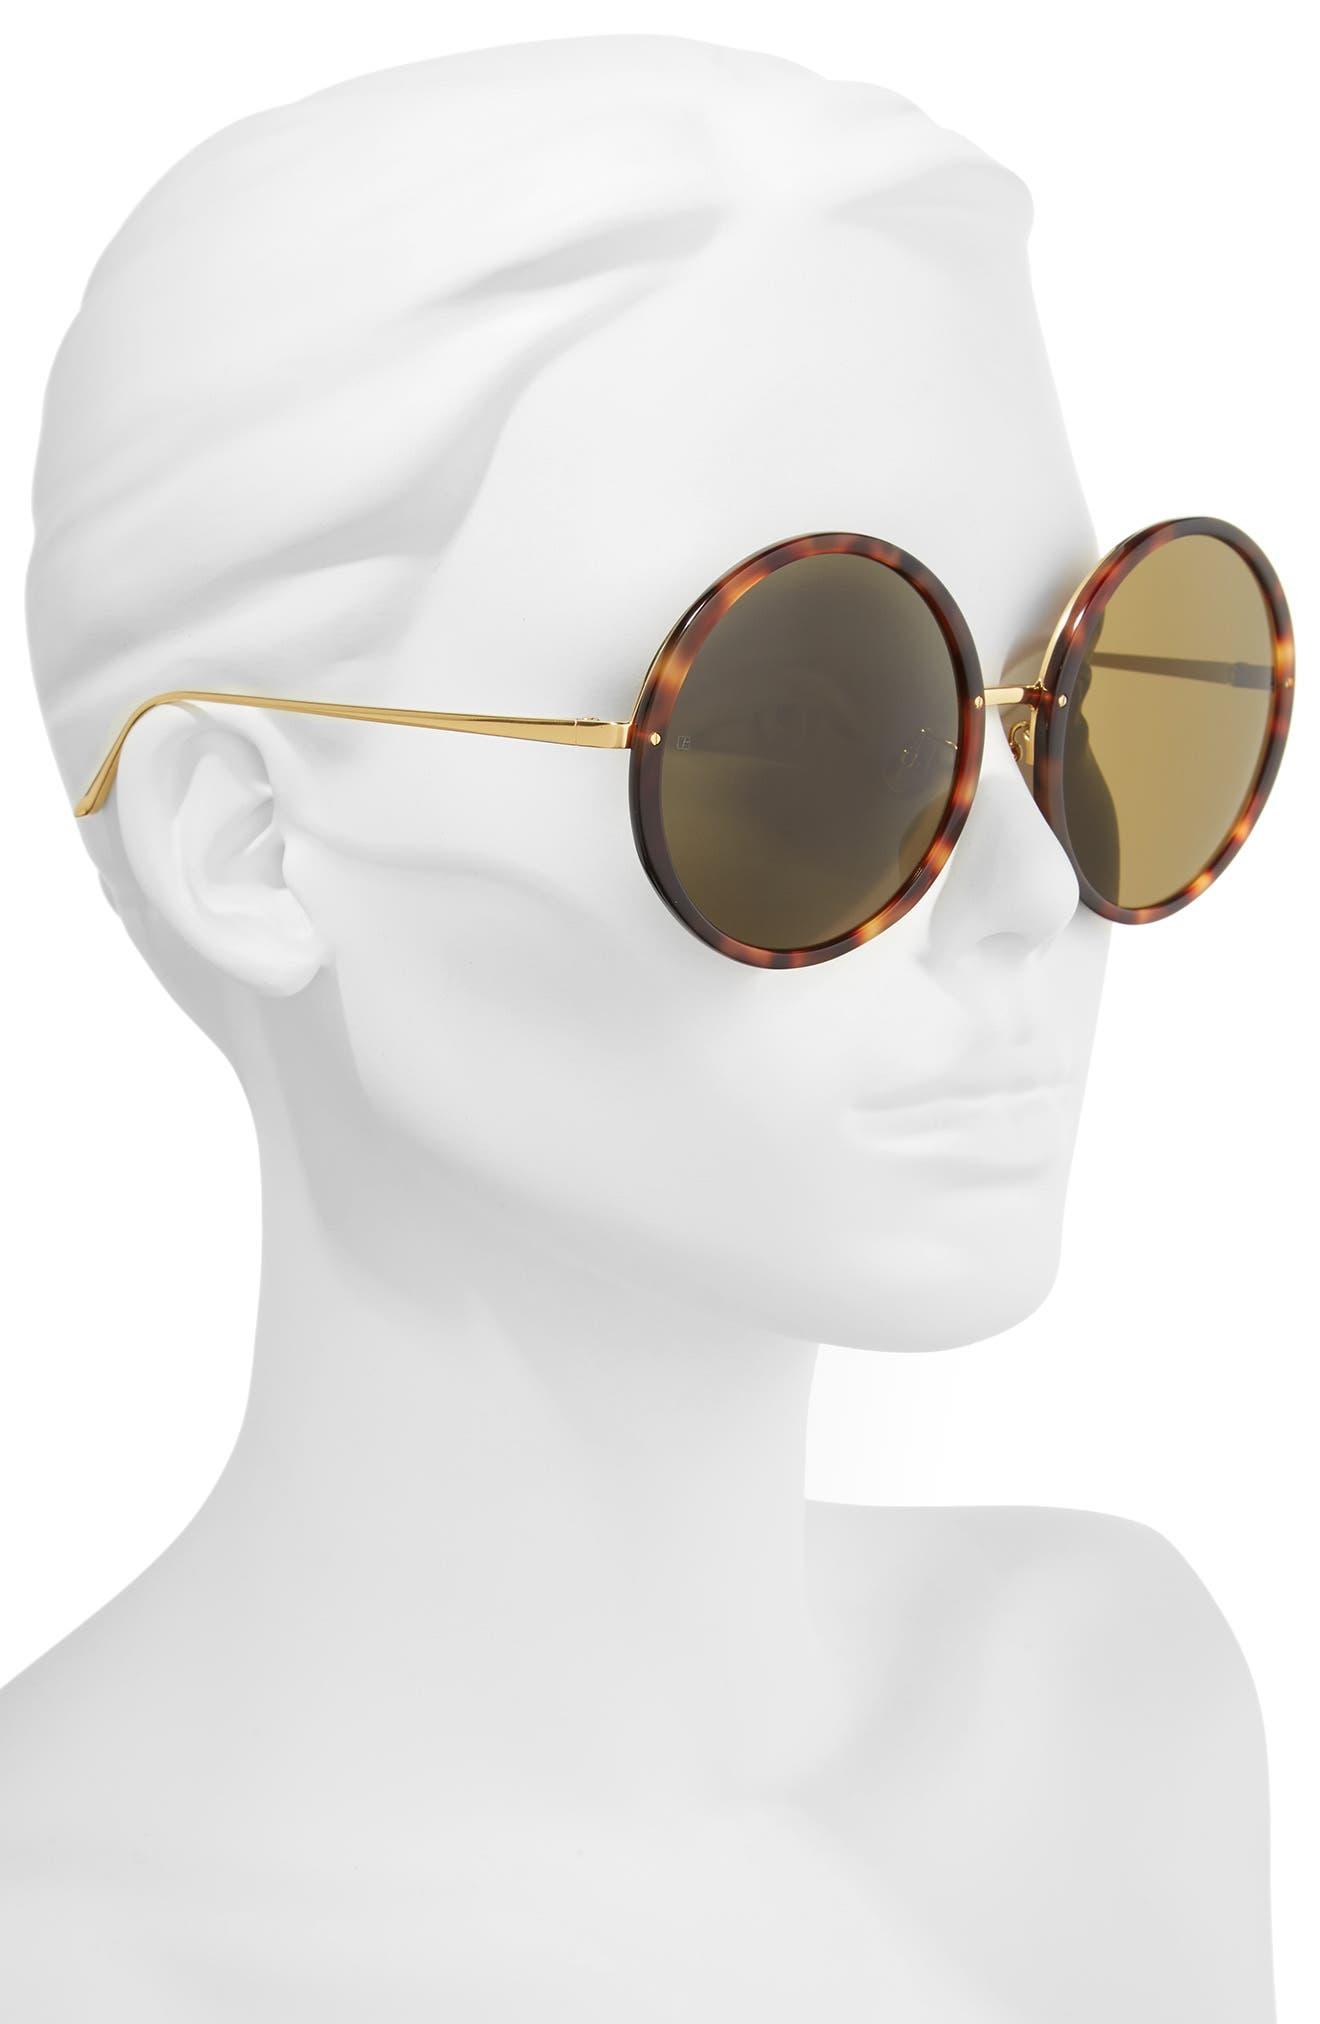 61mm Round 18 Karat Gold Trim Sunglasses,                             Alternate thumbnail 2, color,                             Tortoise/ Yellow Gold/ Brown